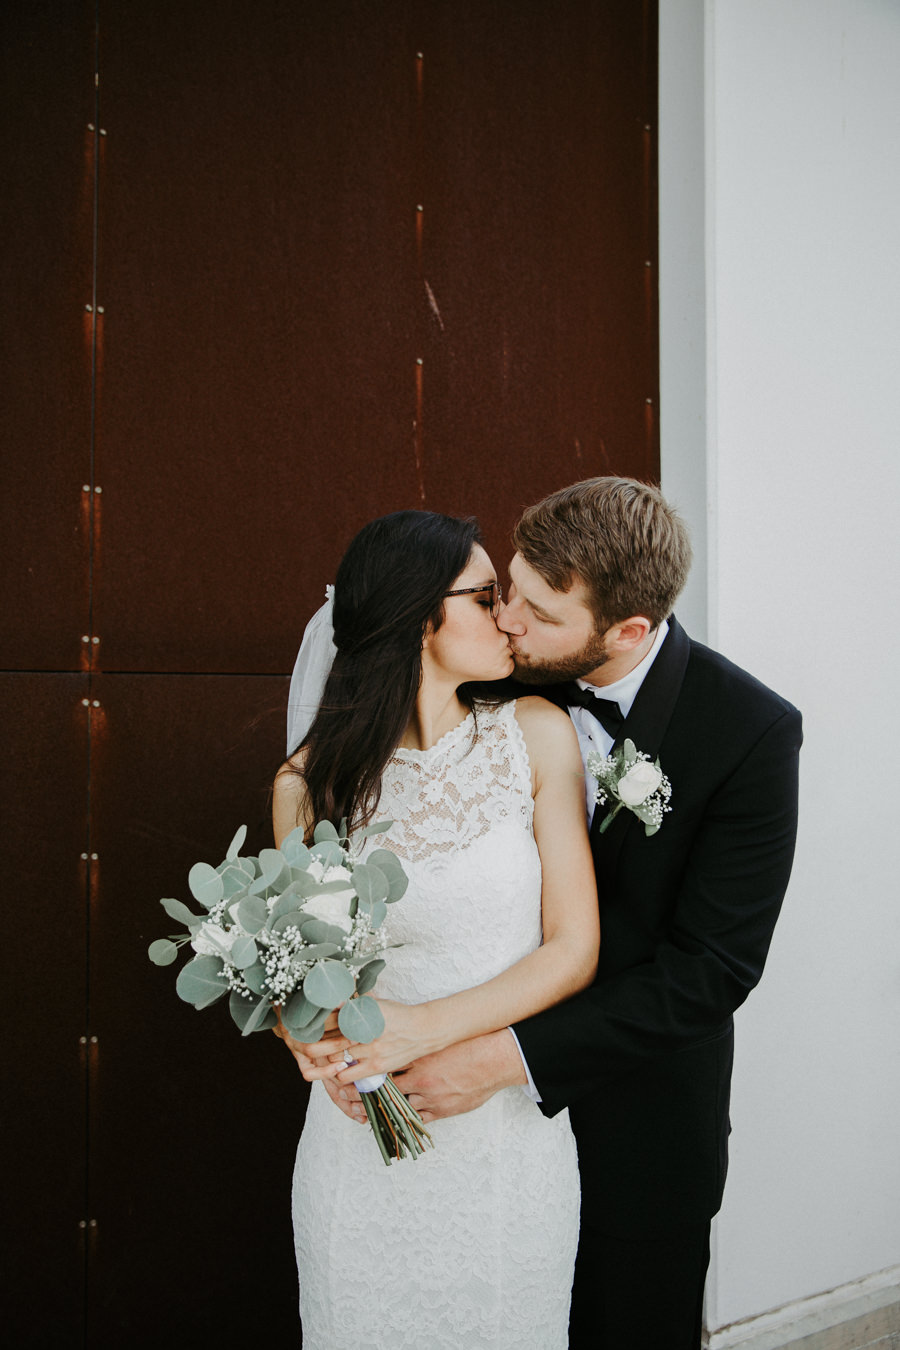 Tampa Heights Industrial Wedding at Cavu Emmy RJ-112.jpg